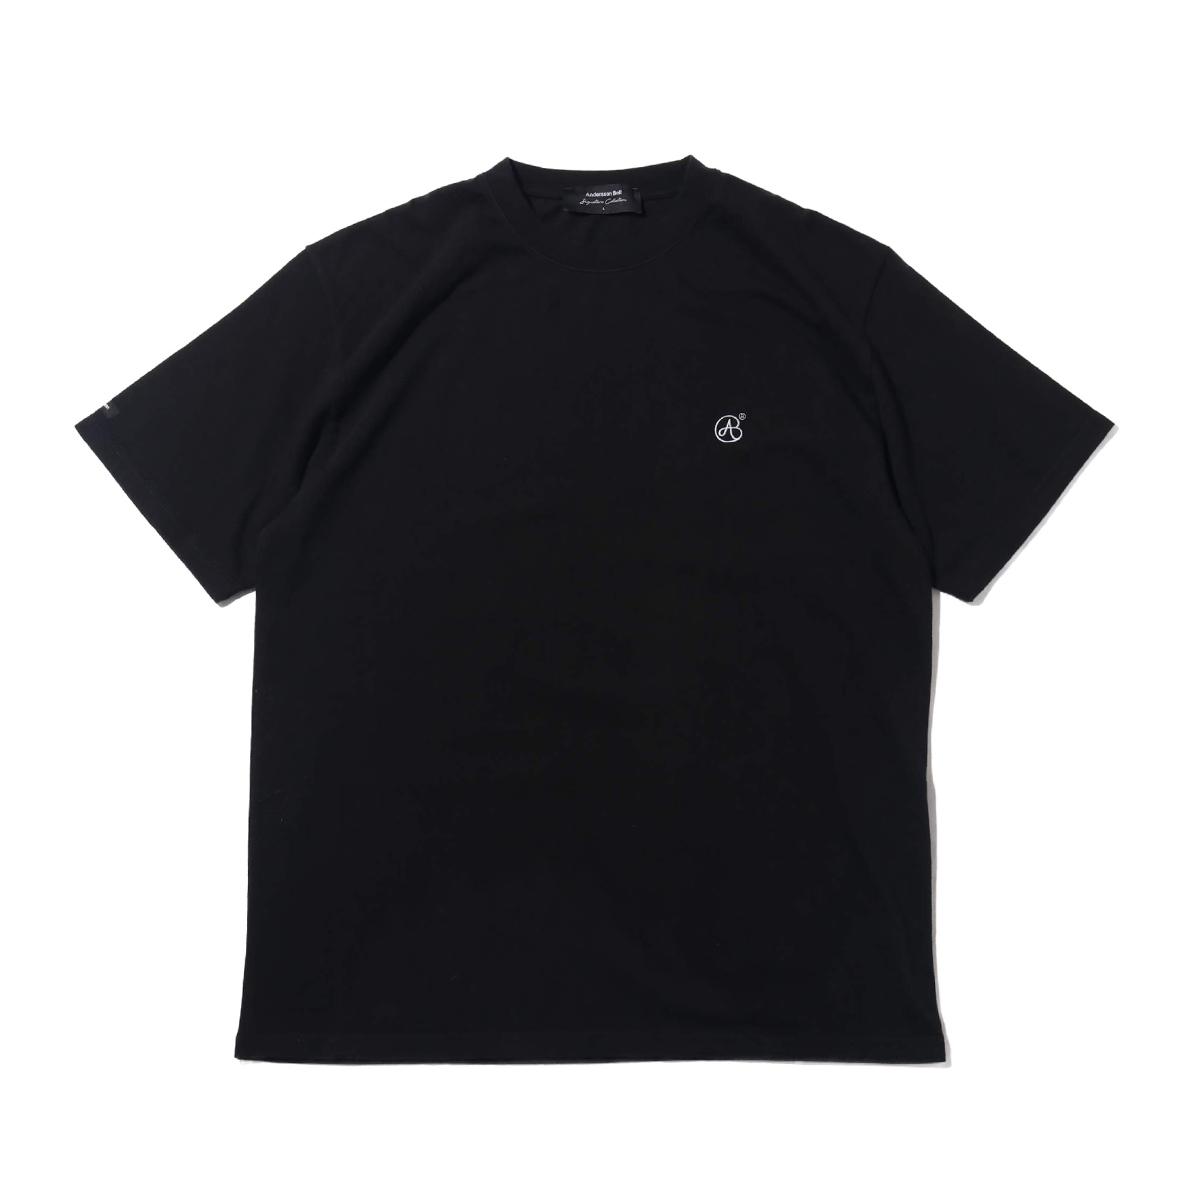 Andersson Bell UNISEX SIGNATURE EMBLEM T-SHIRT(アンダーソンベル シグネチャー エンブレム ティー)BLACK【メンズ レディース 半袖Tシャツ】19SU-I